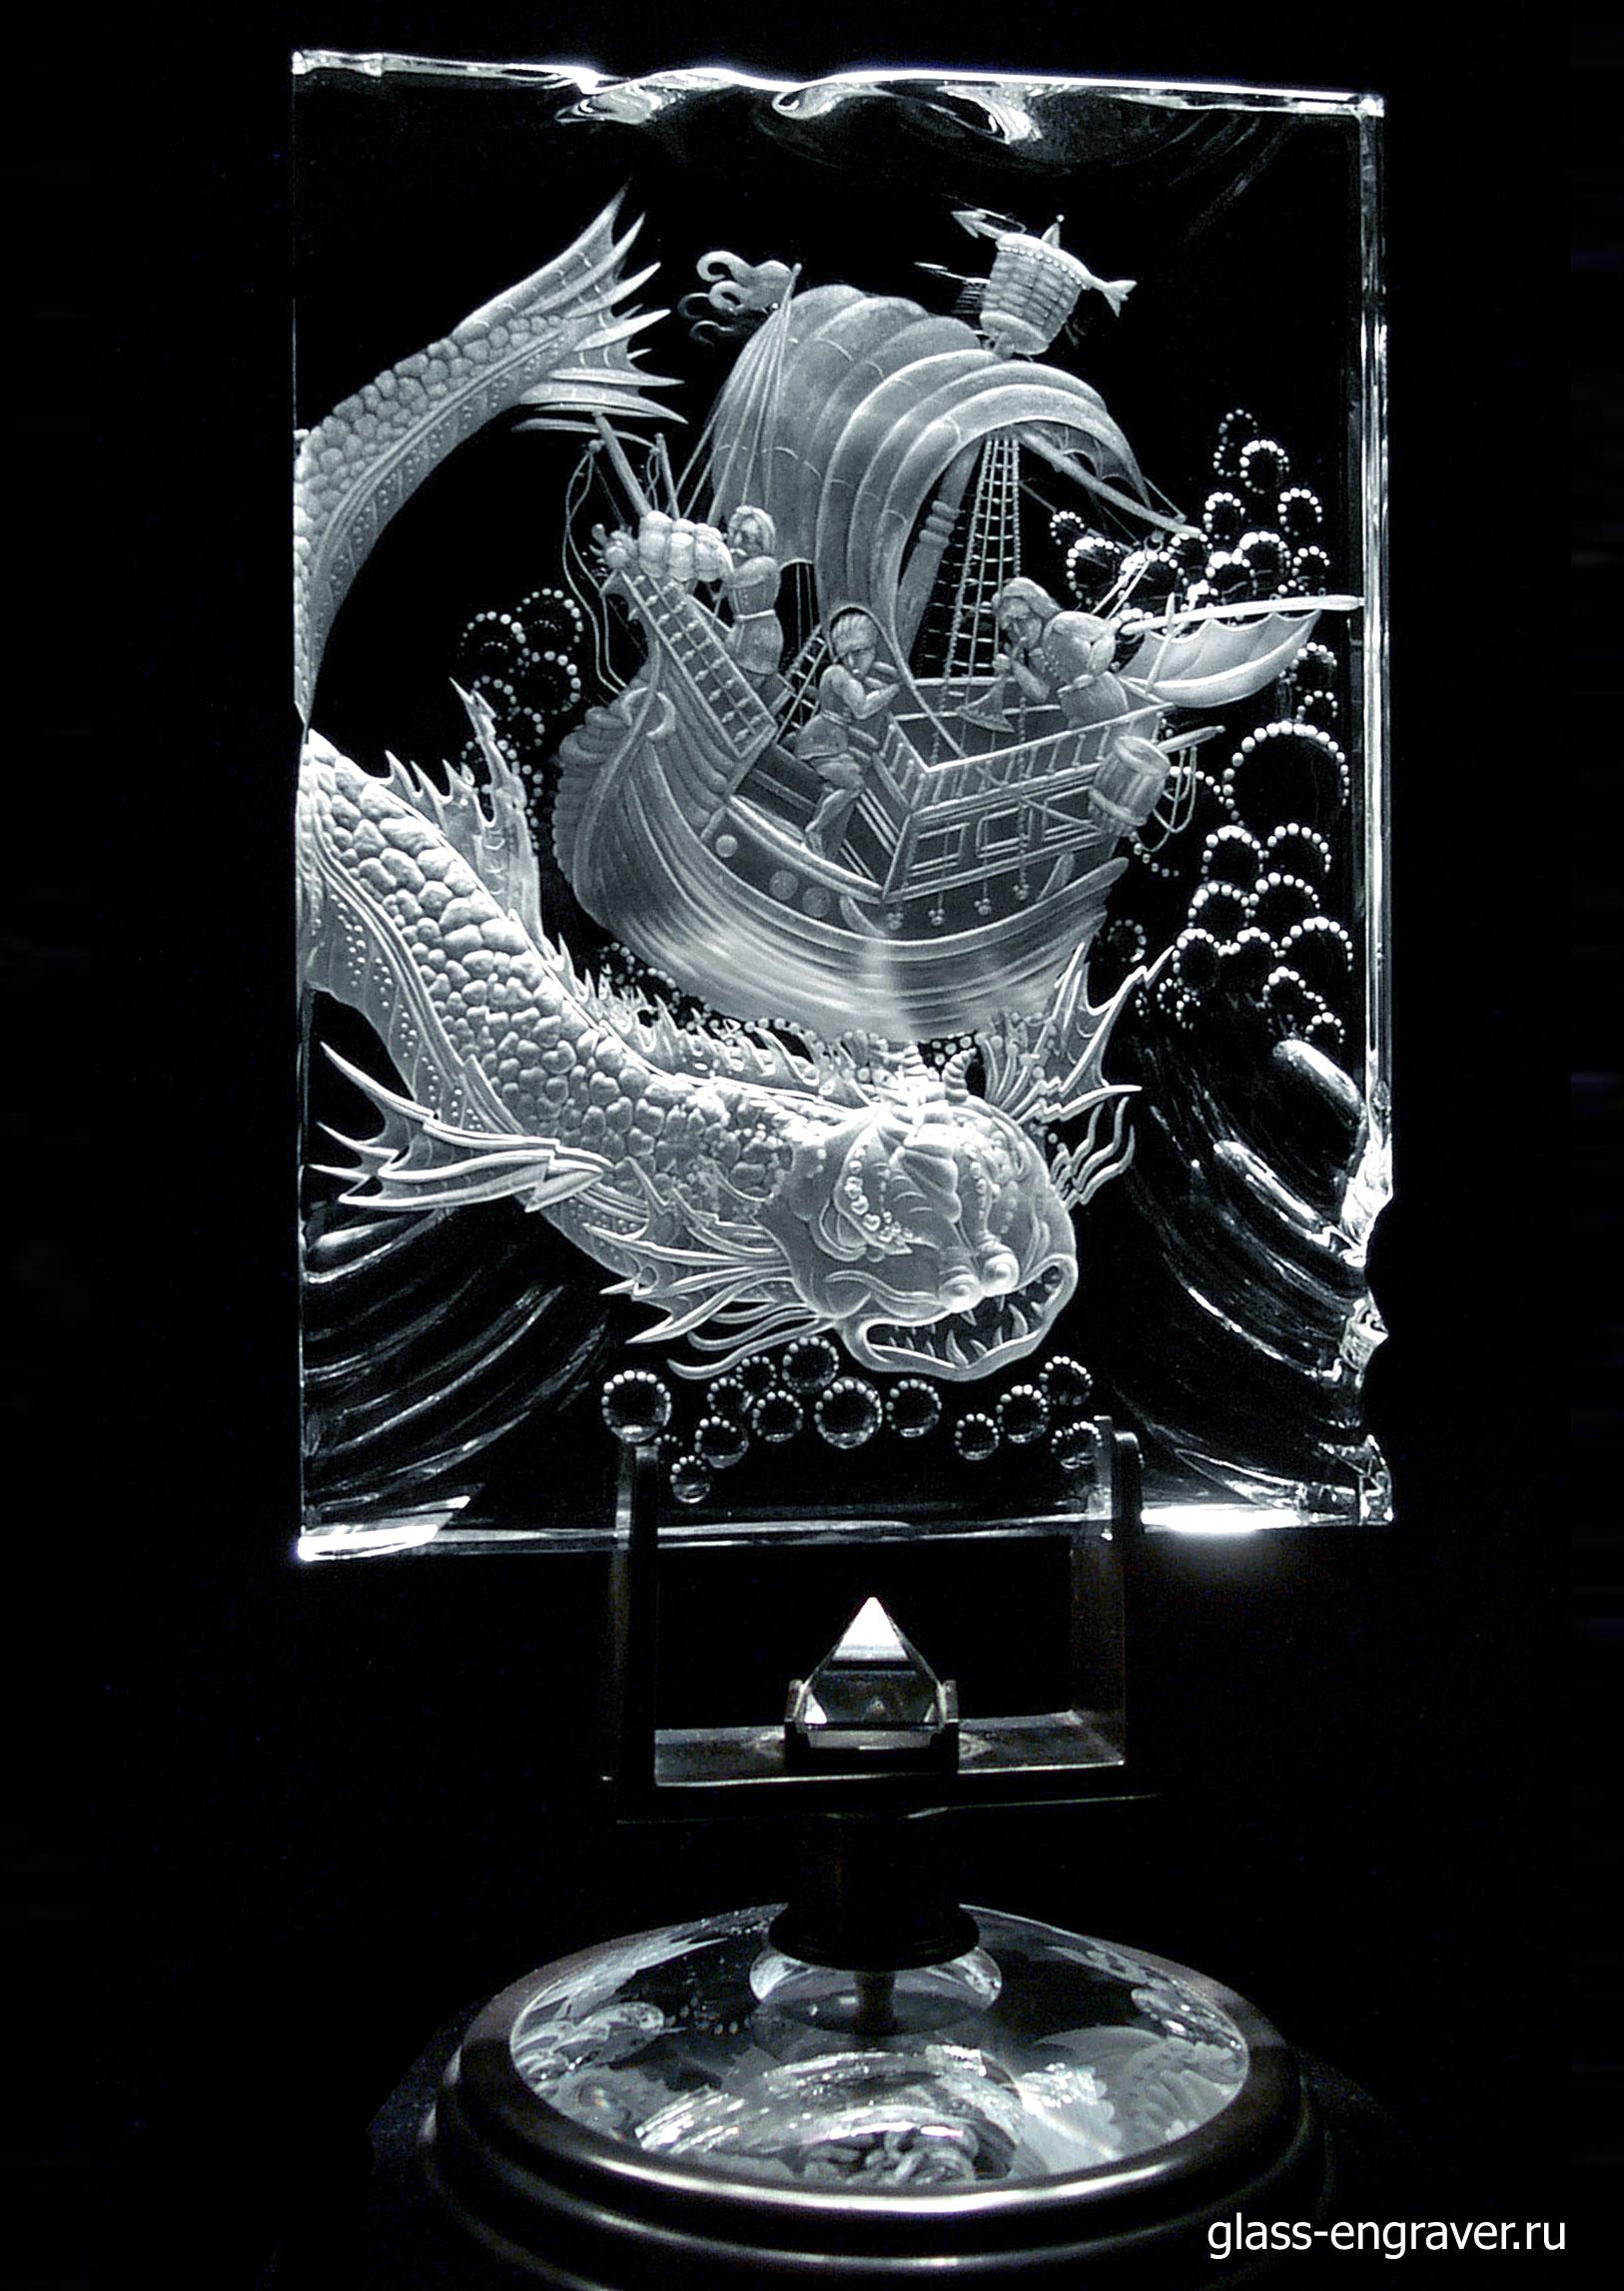 Арт-объект Балена - гравированное стекло